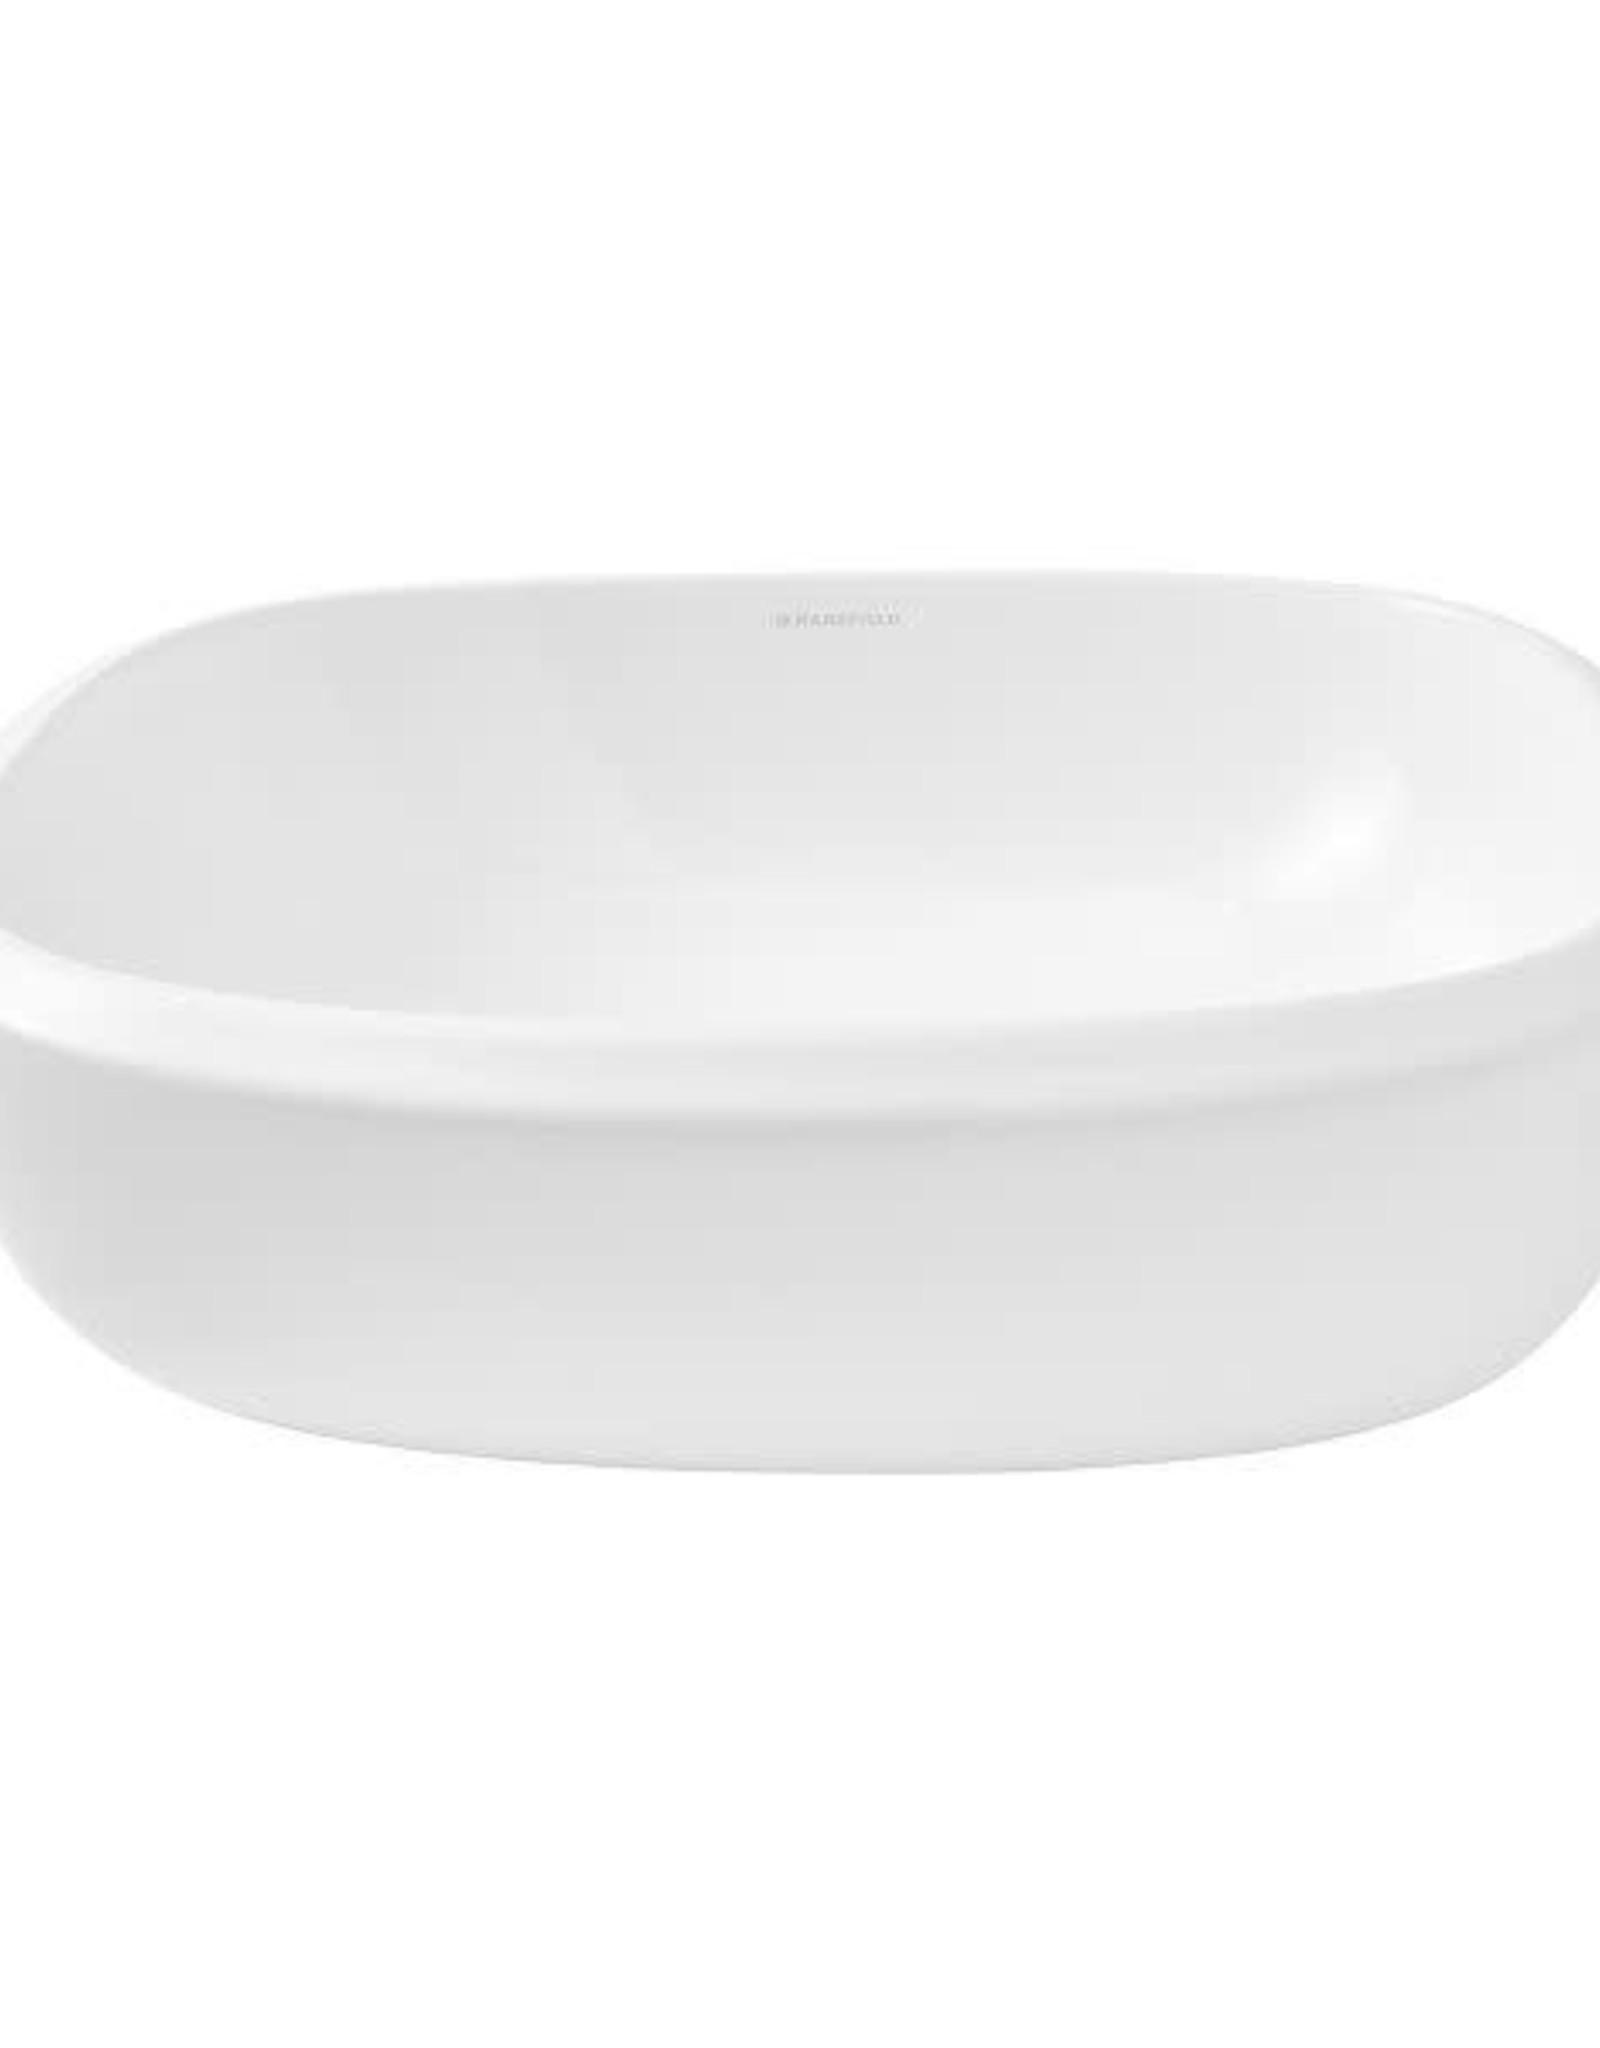 Mansfield Mansfield Ava Vessel Sink White